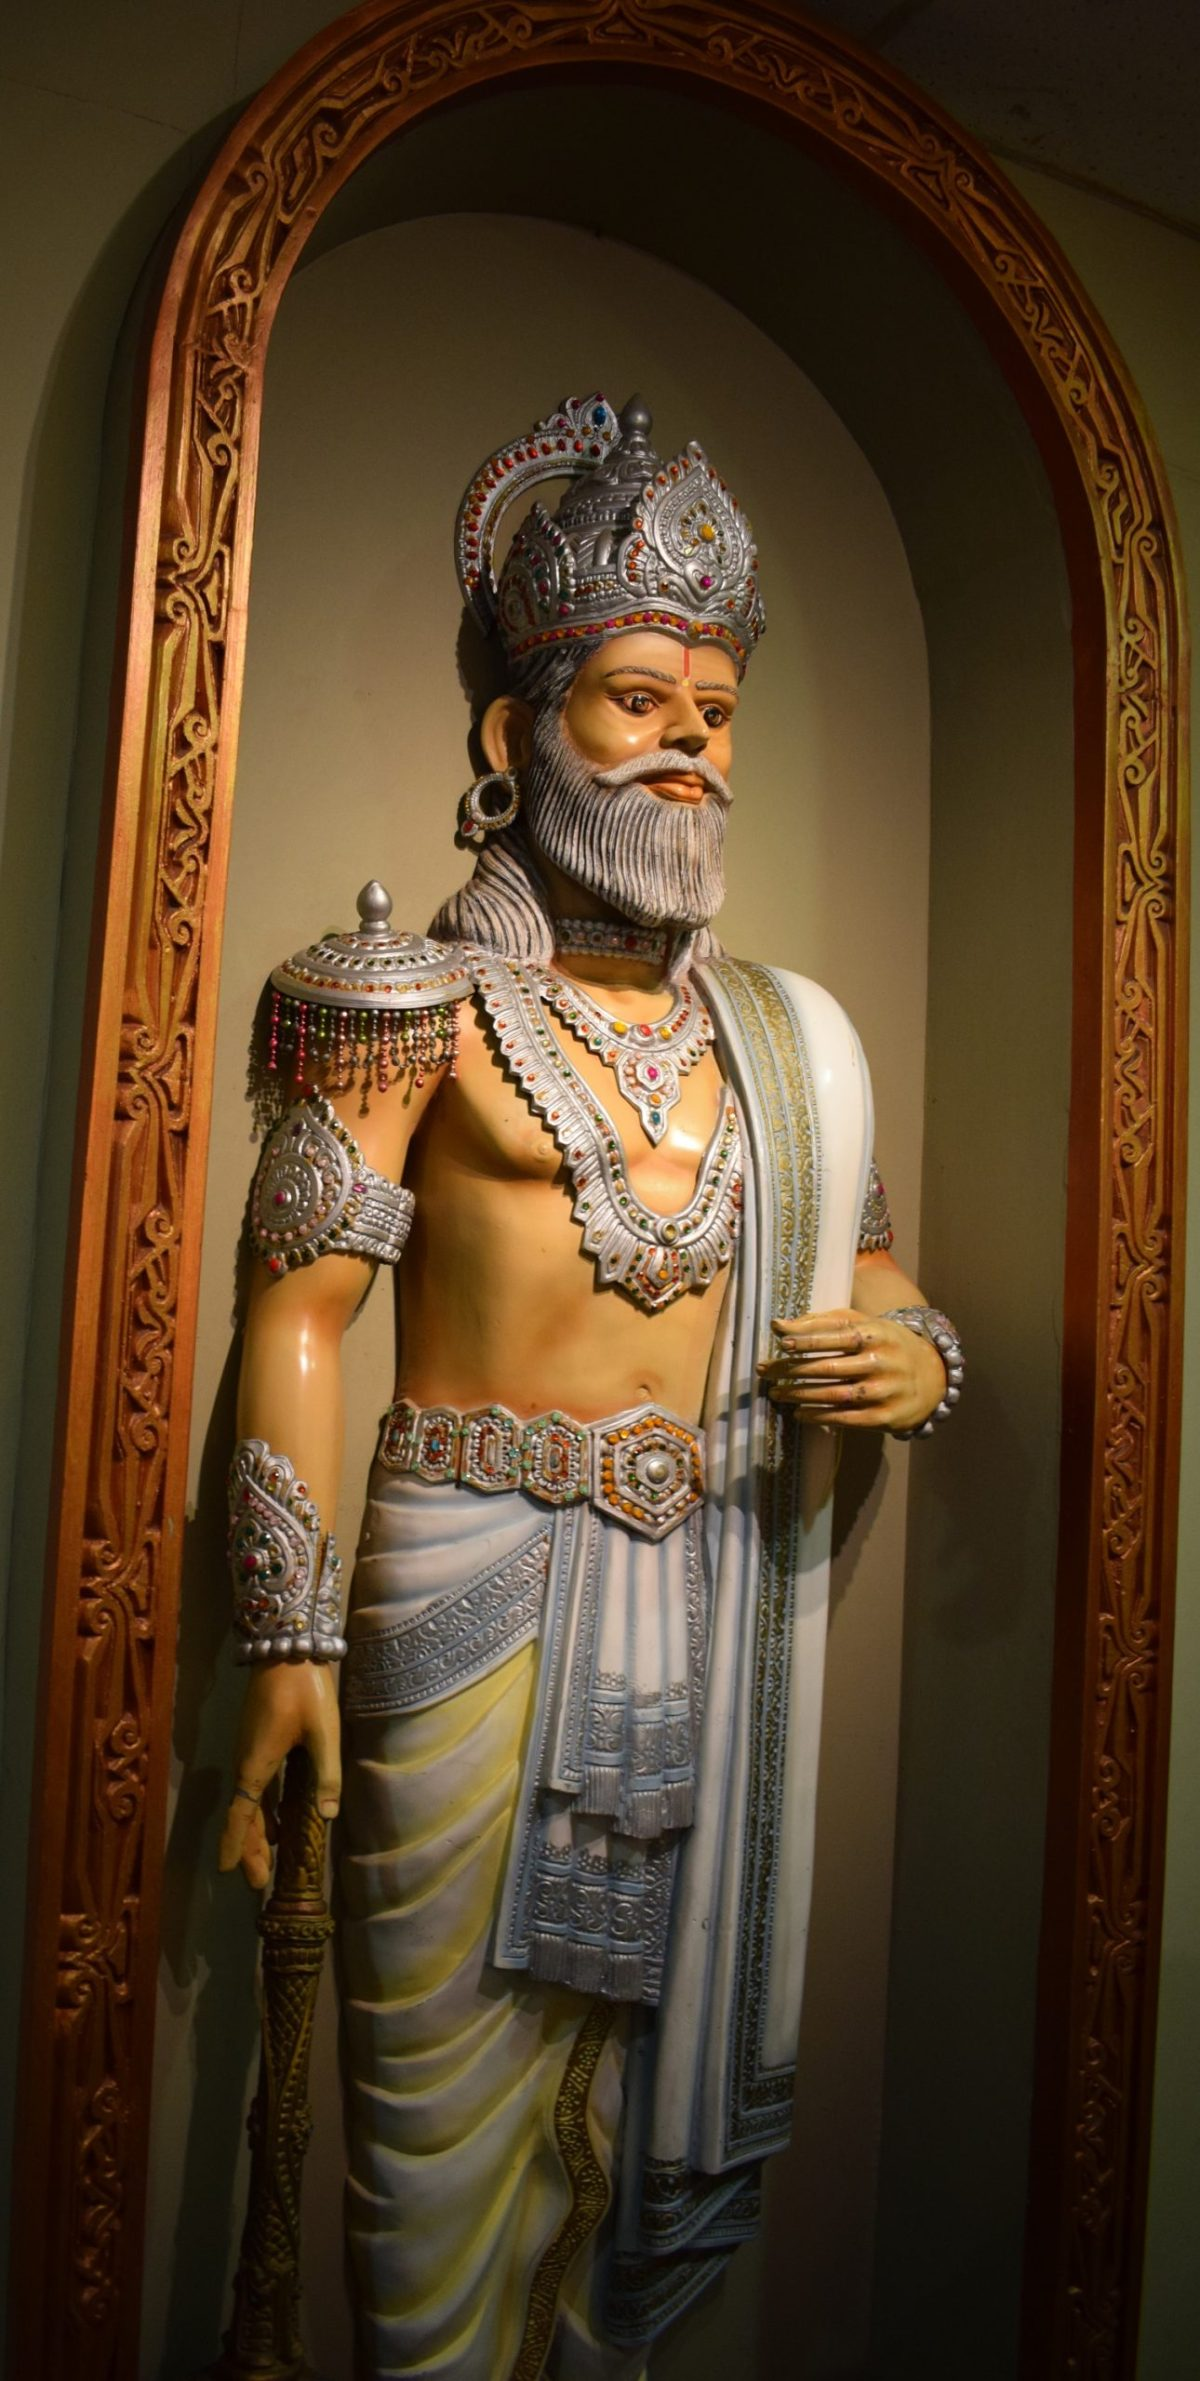 Mahabharat set in Ramoji film city 3 Ramoji film City Guide,6 Sets photos of Beautiful places.